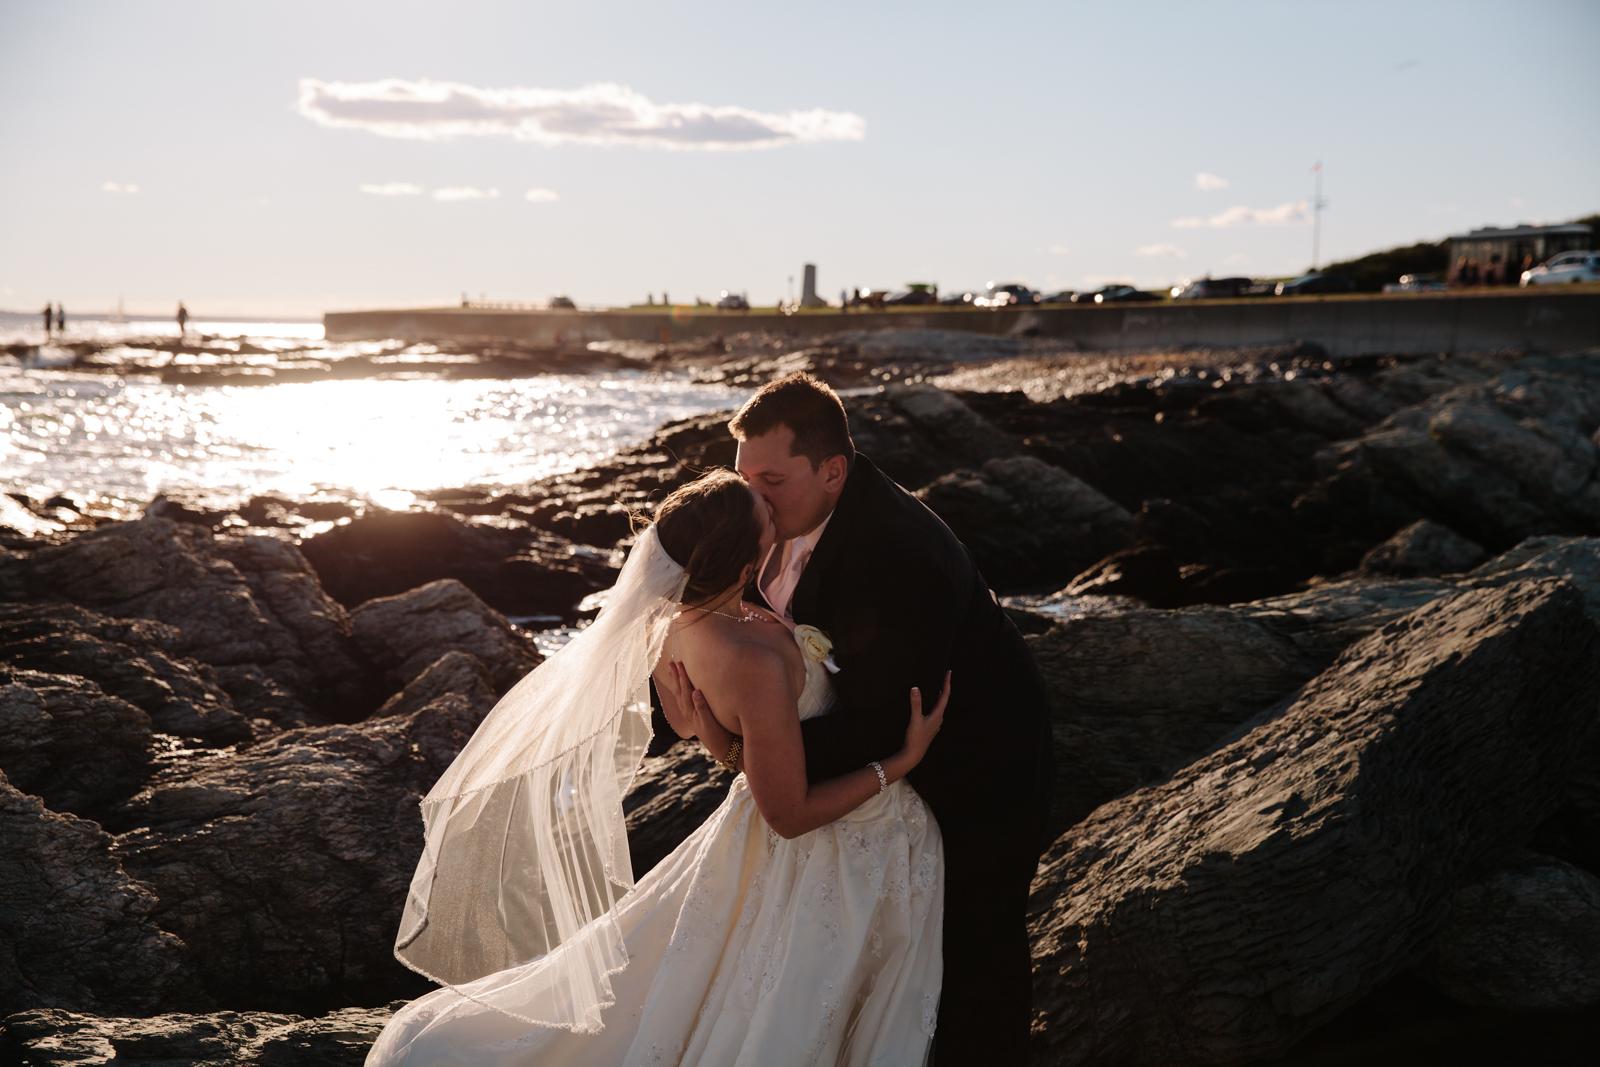 Eastons-Beach-Rotunda-Ballroom-Wedding-Newport-Rhode-Island-PhotographybyAmandaMorgan-74.jpg